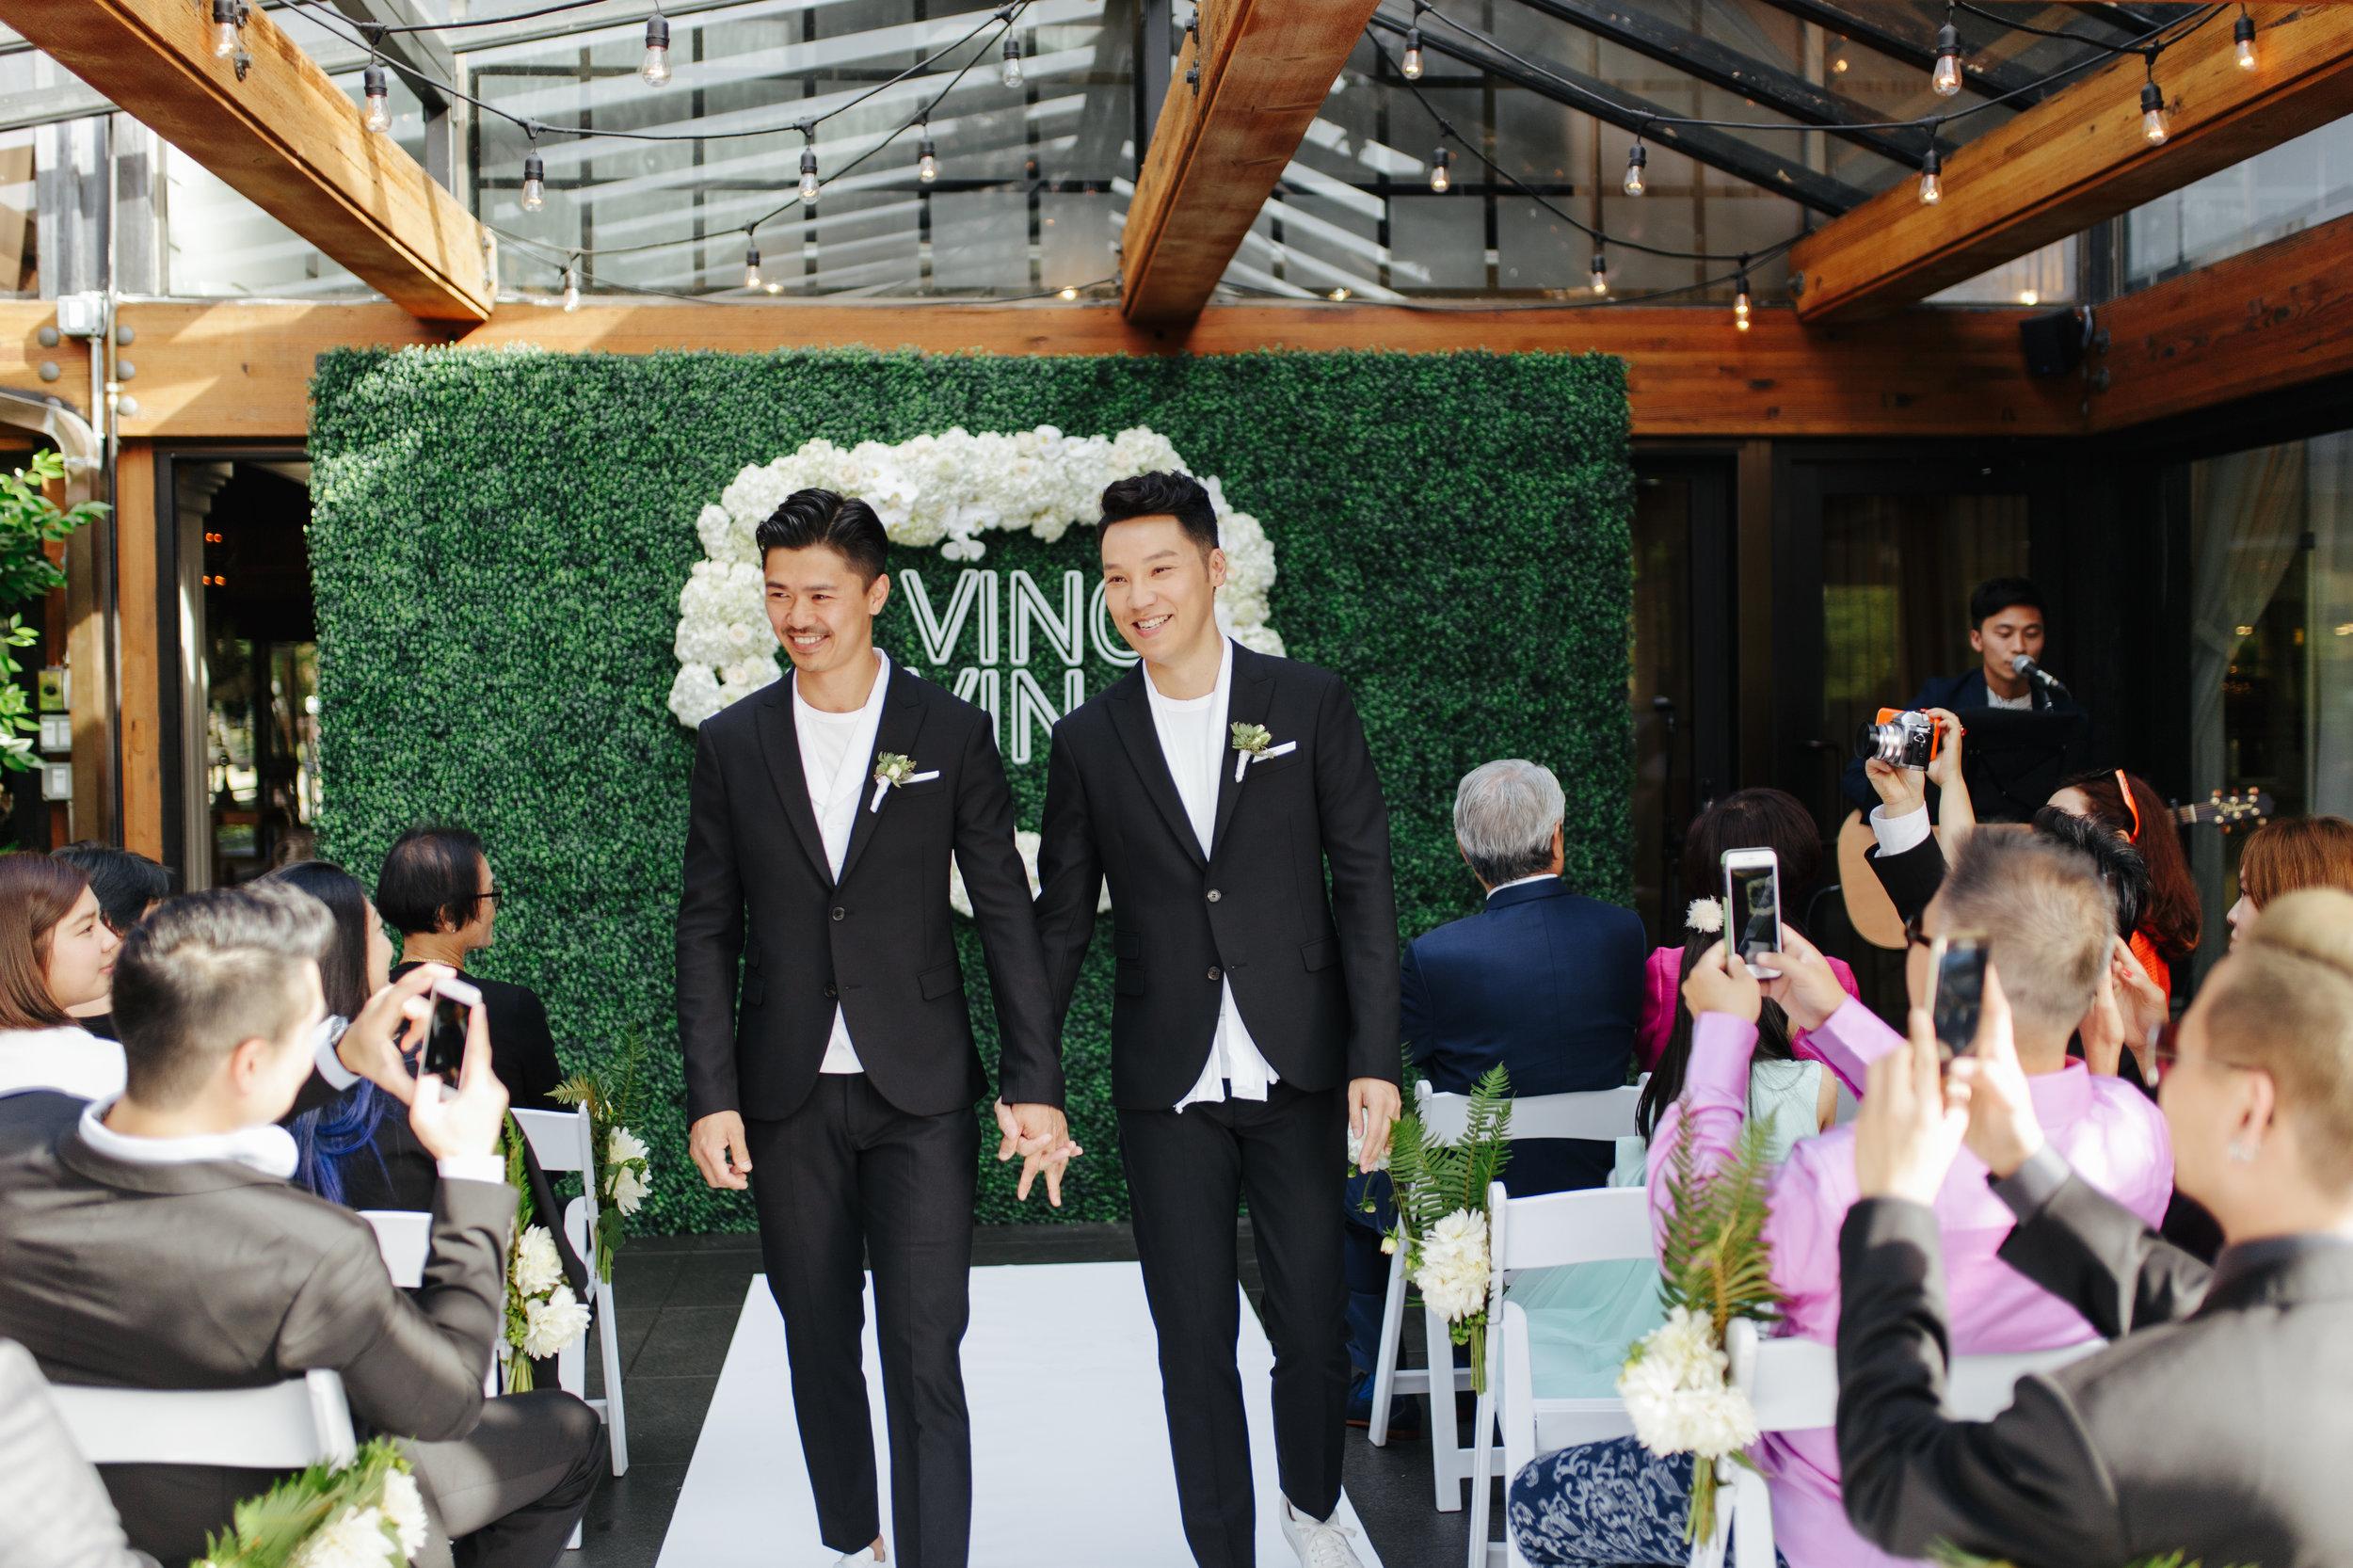 herafilms_vinci_kevin_wedding_hera_selects-28.jpg